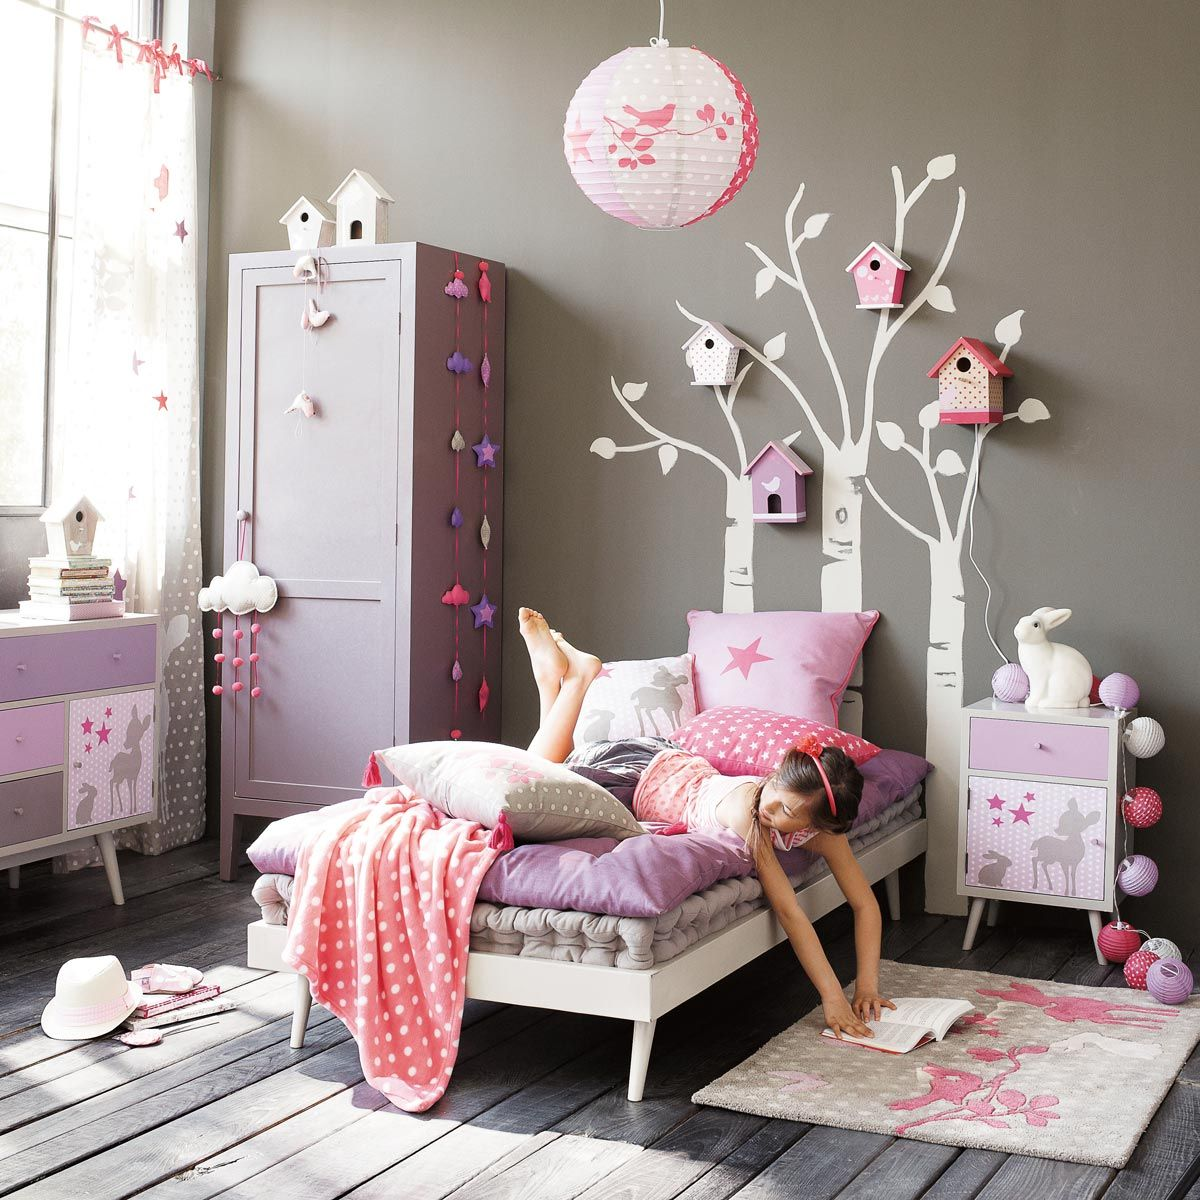 The the birdhouse placement x | Cosas para mi niña | Pinterest ...